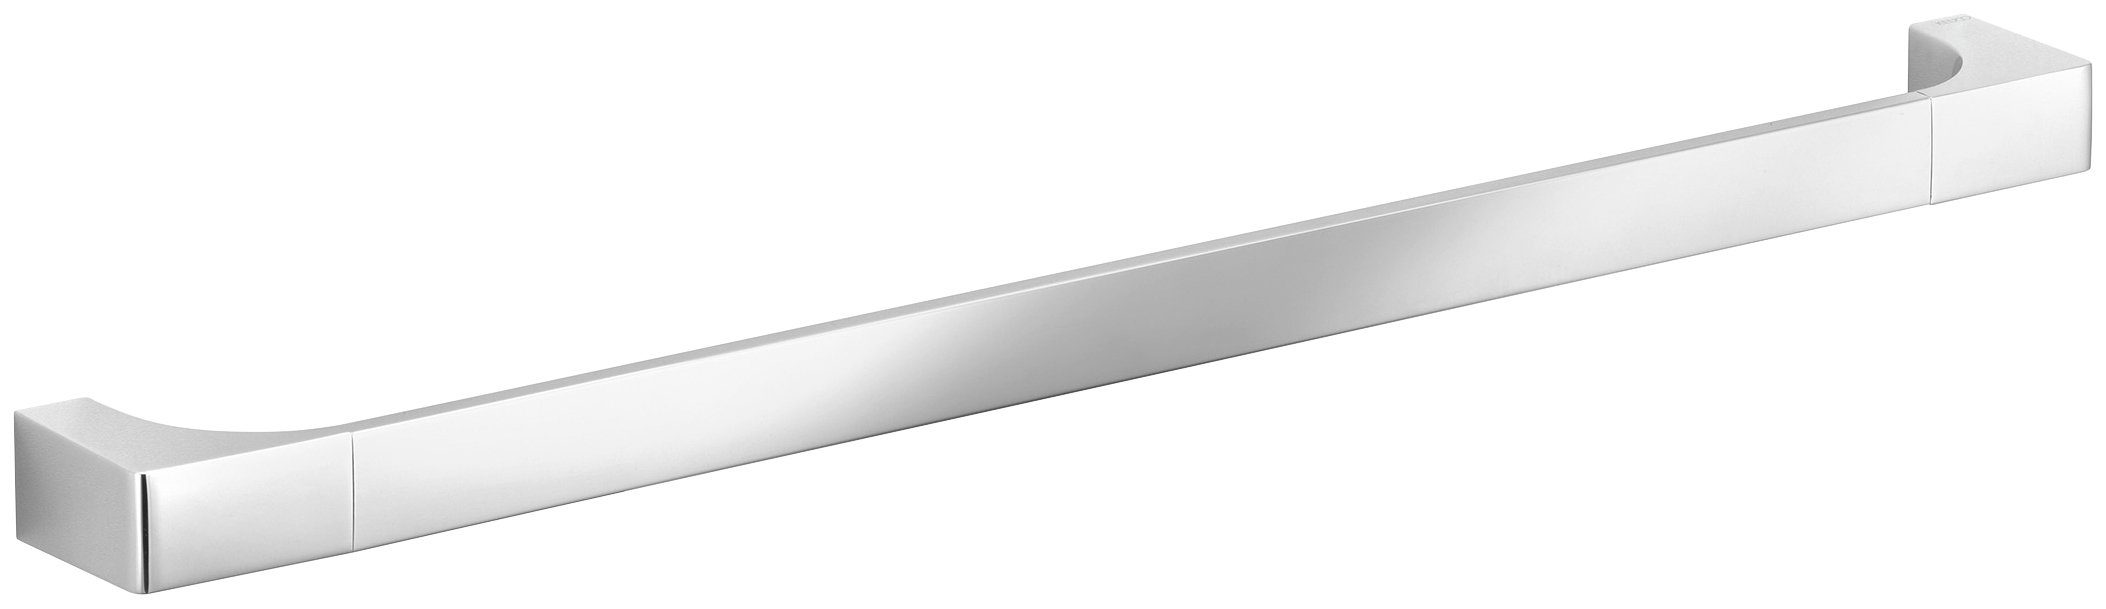 KEUCO Handtuchhalter »Edition 11«, verchromt, Breite 100 cm